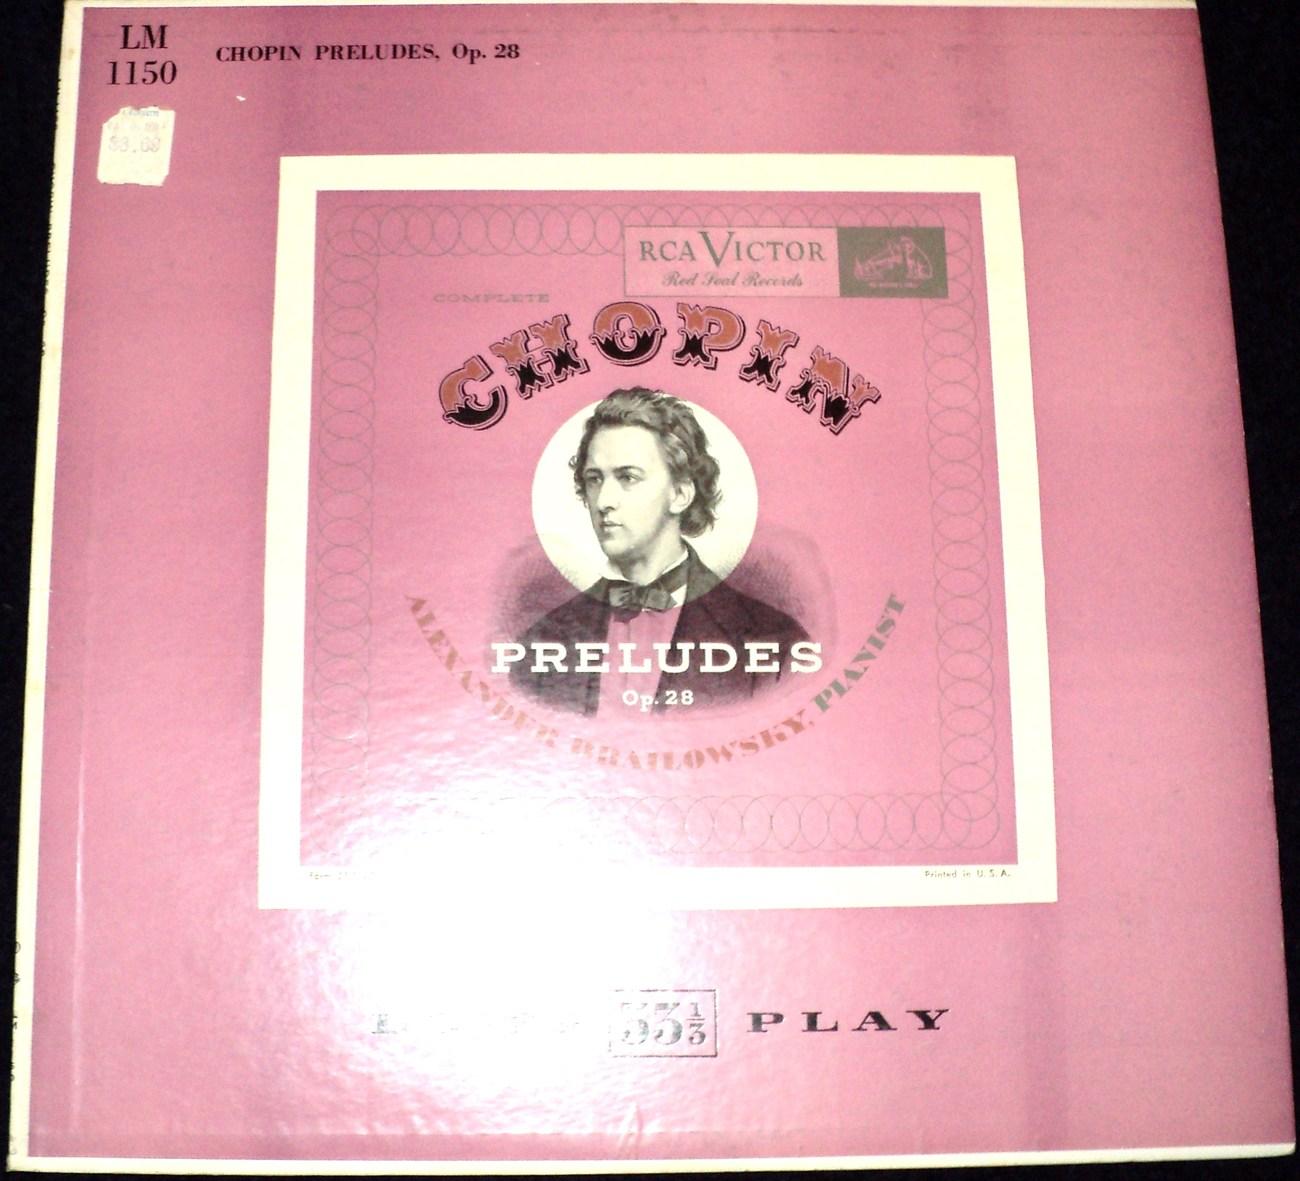 CHOPIN: PRELUDES, OP. 28, ALEXANDER BRAILOWSKY, PIANIST LP